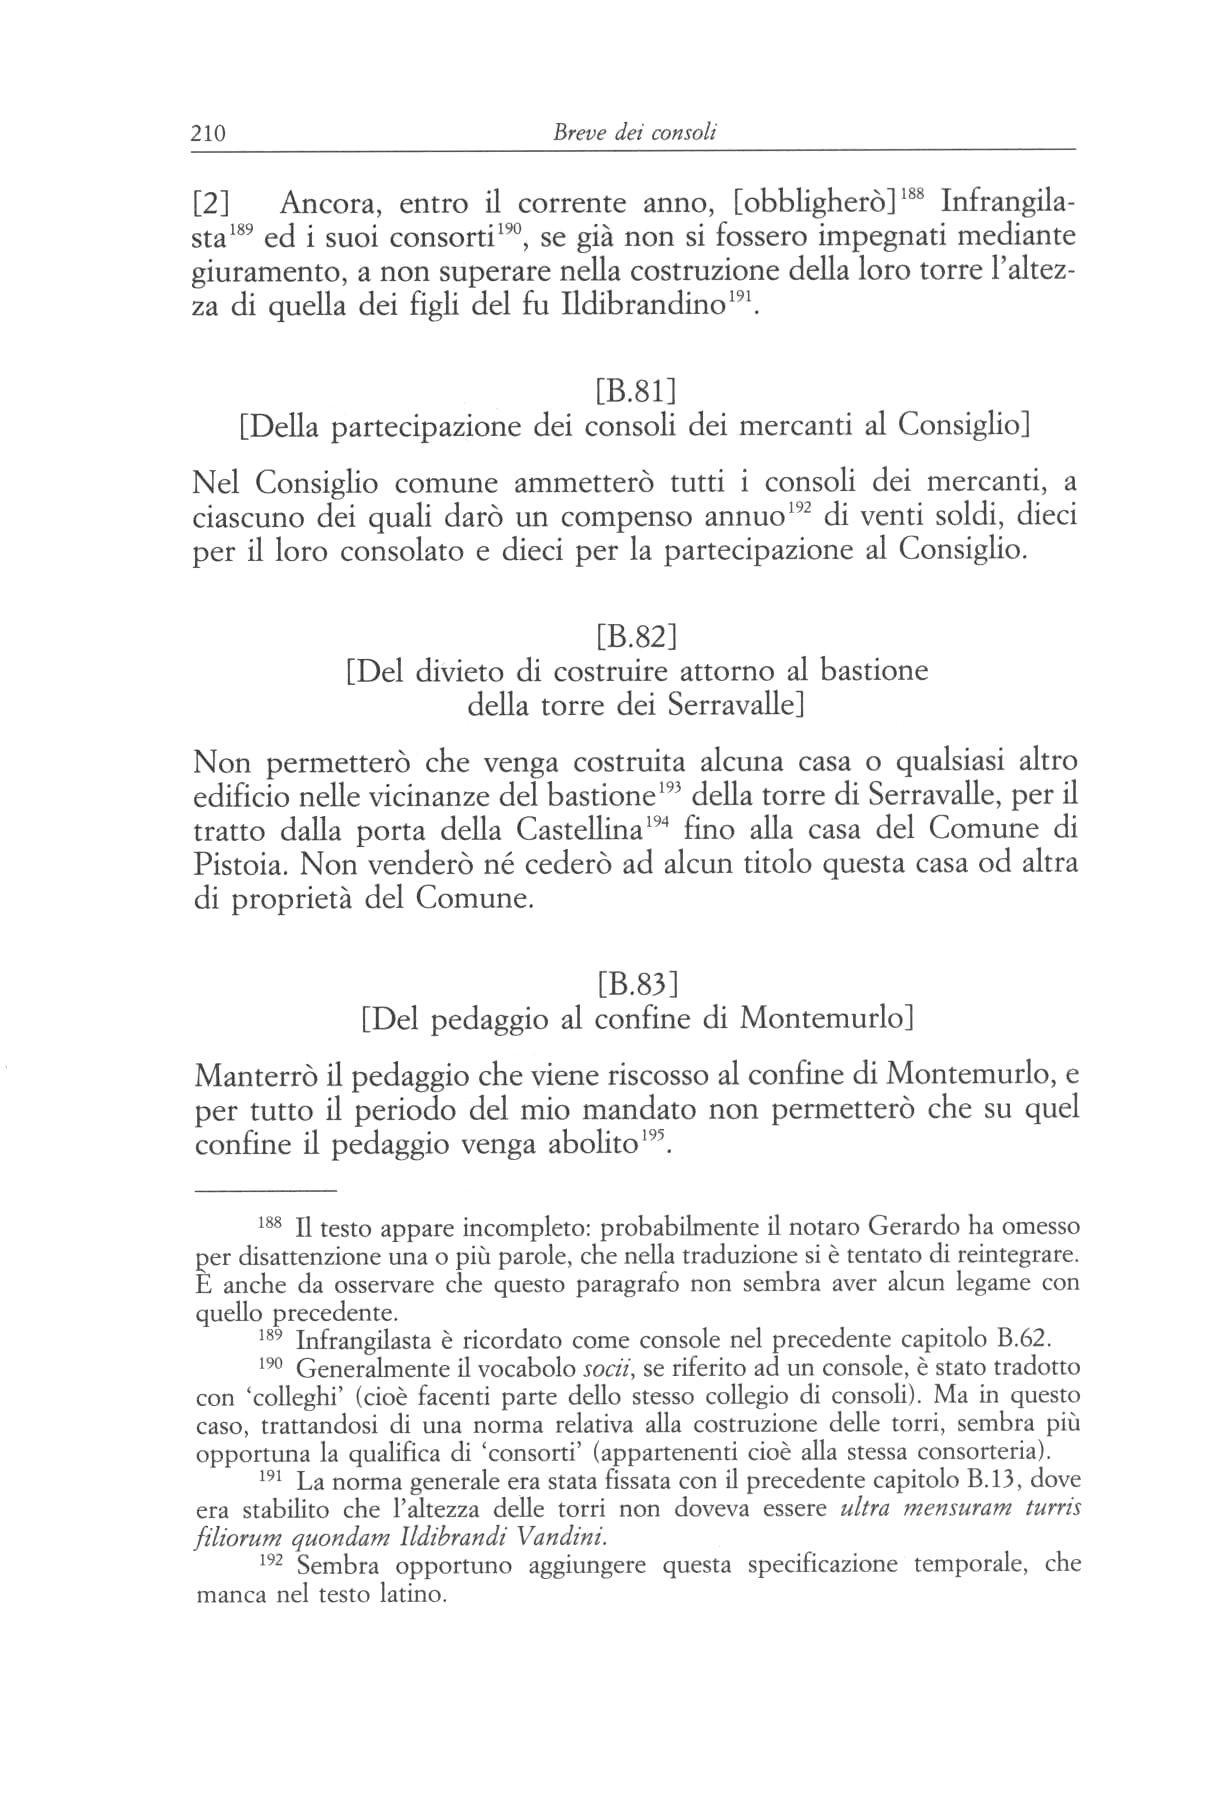 statuti pistoiesi del sec.XII 0210.jpg